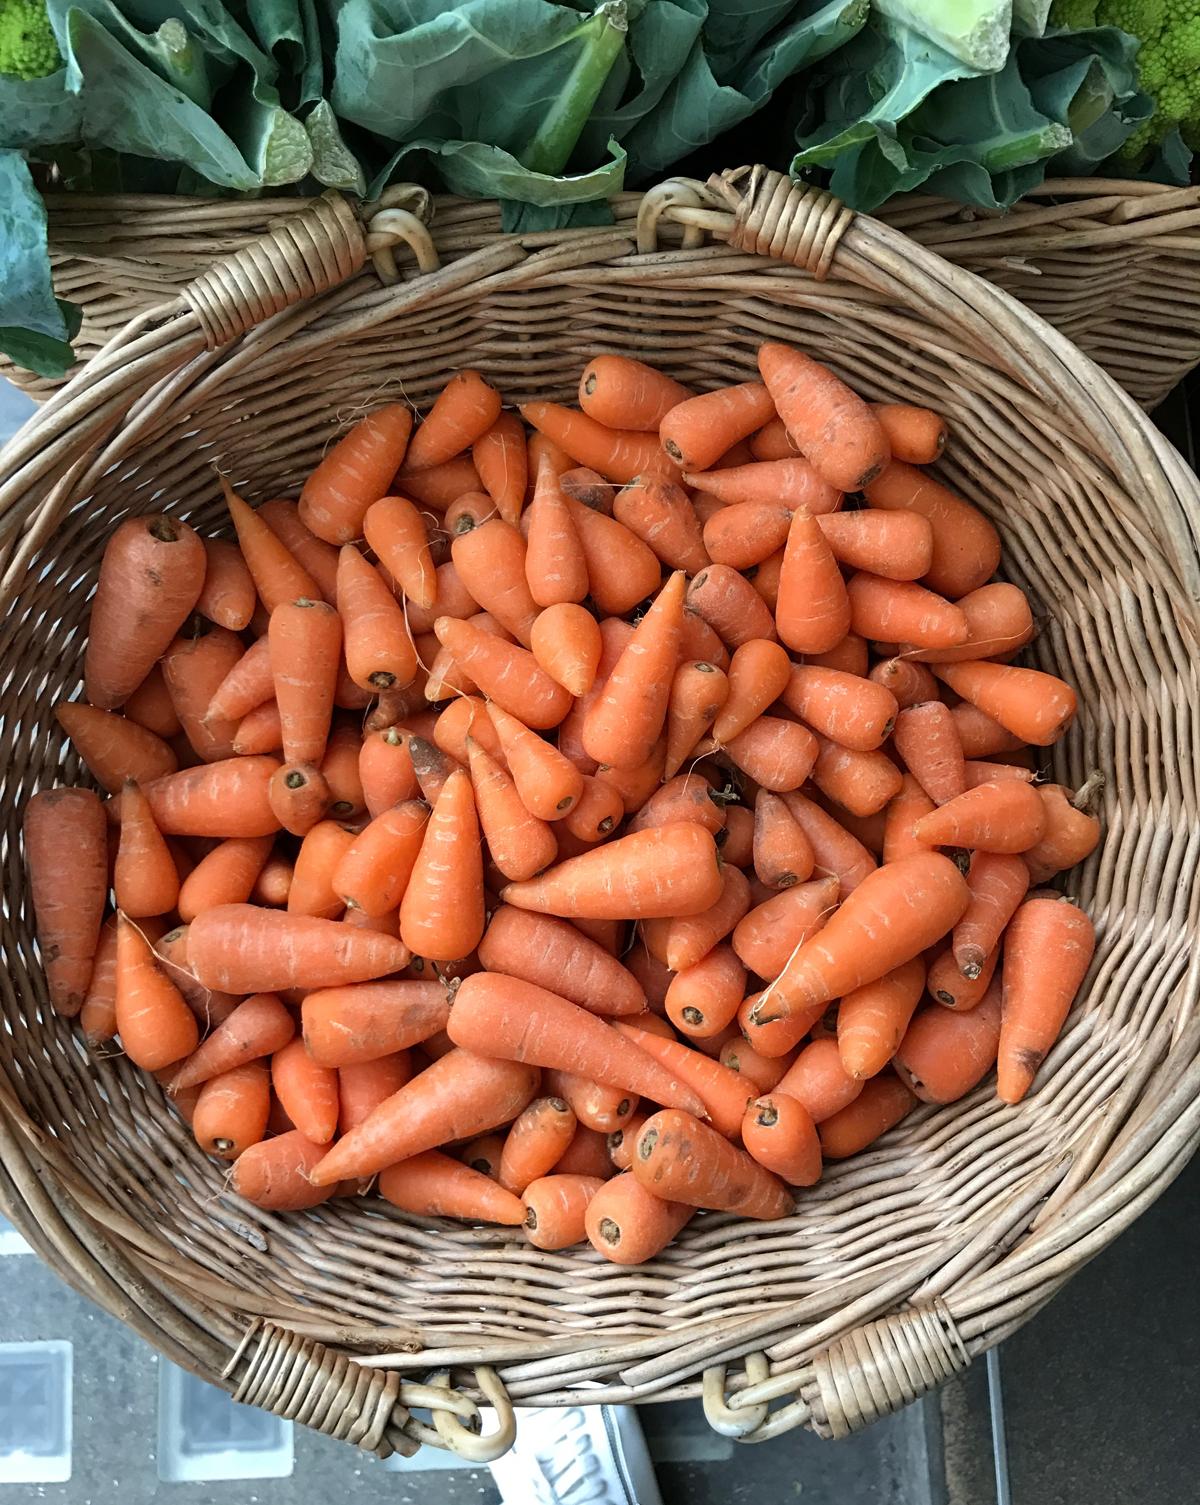 Wee little carrots